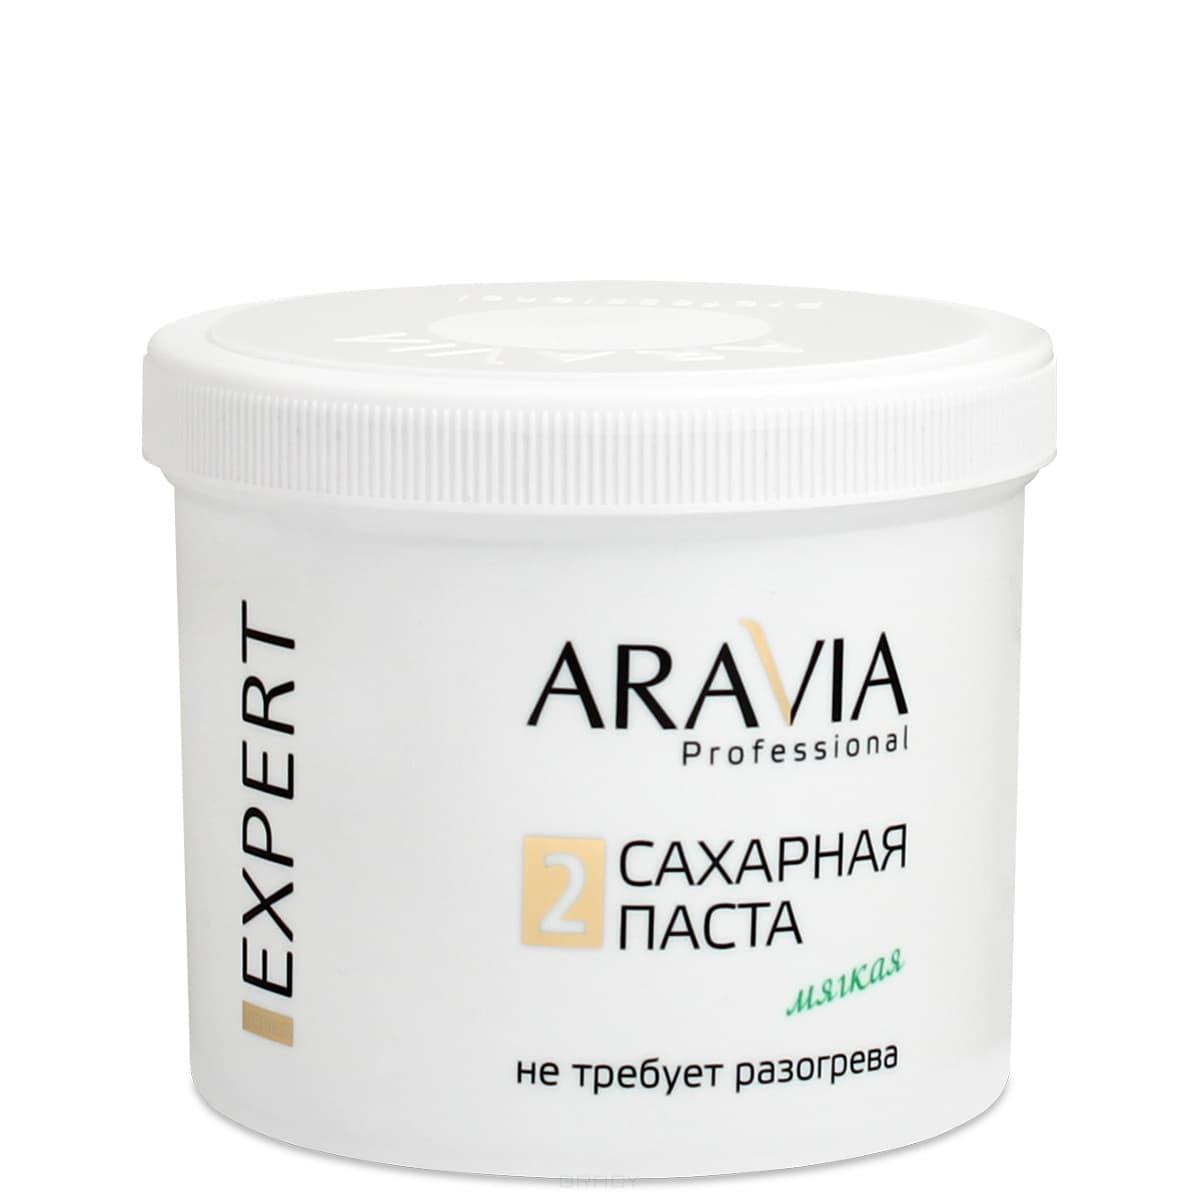 Aravia Сахарная паста для депиляции EXPERT 2 Мягкая, 750 гр, Сахарная паста для депиляции EXPERT 2 Мягкая, 750 гр, 750 гр воск aravia professional expert мягкая 750 г